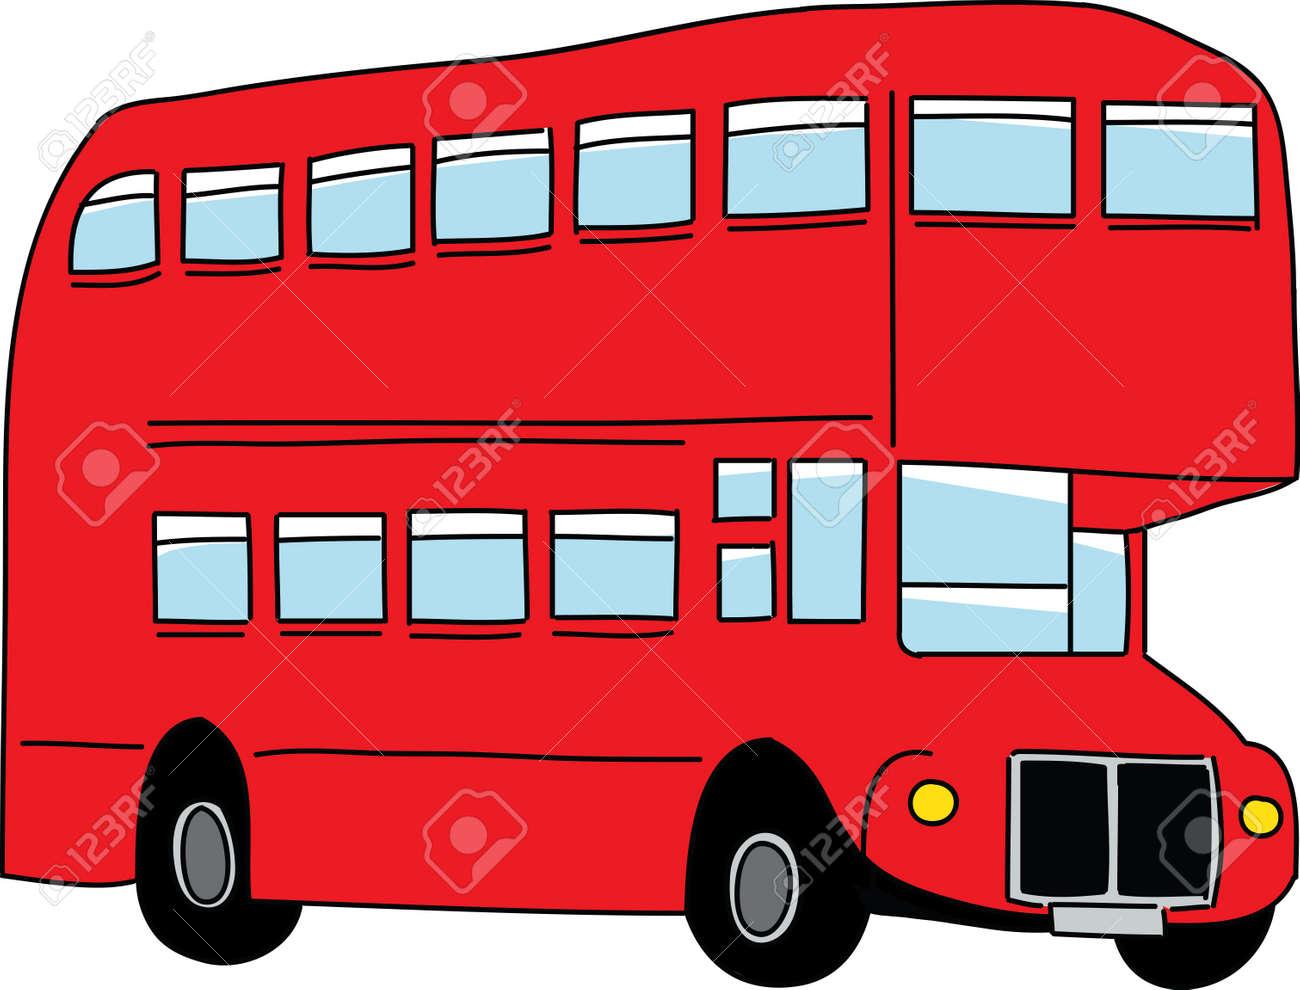 London bus  Vector illustration Stock Vector - 13039430